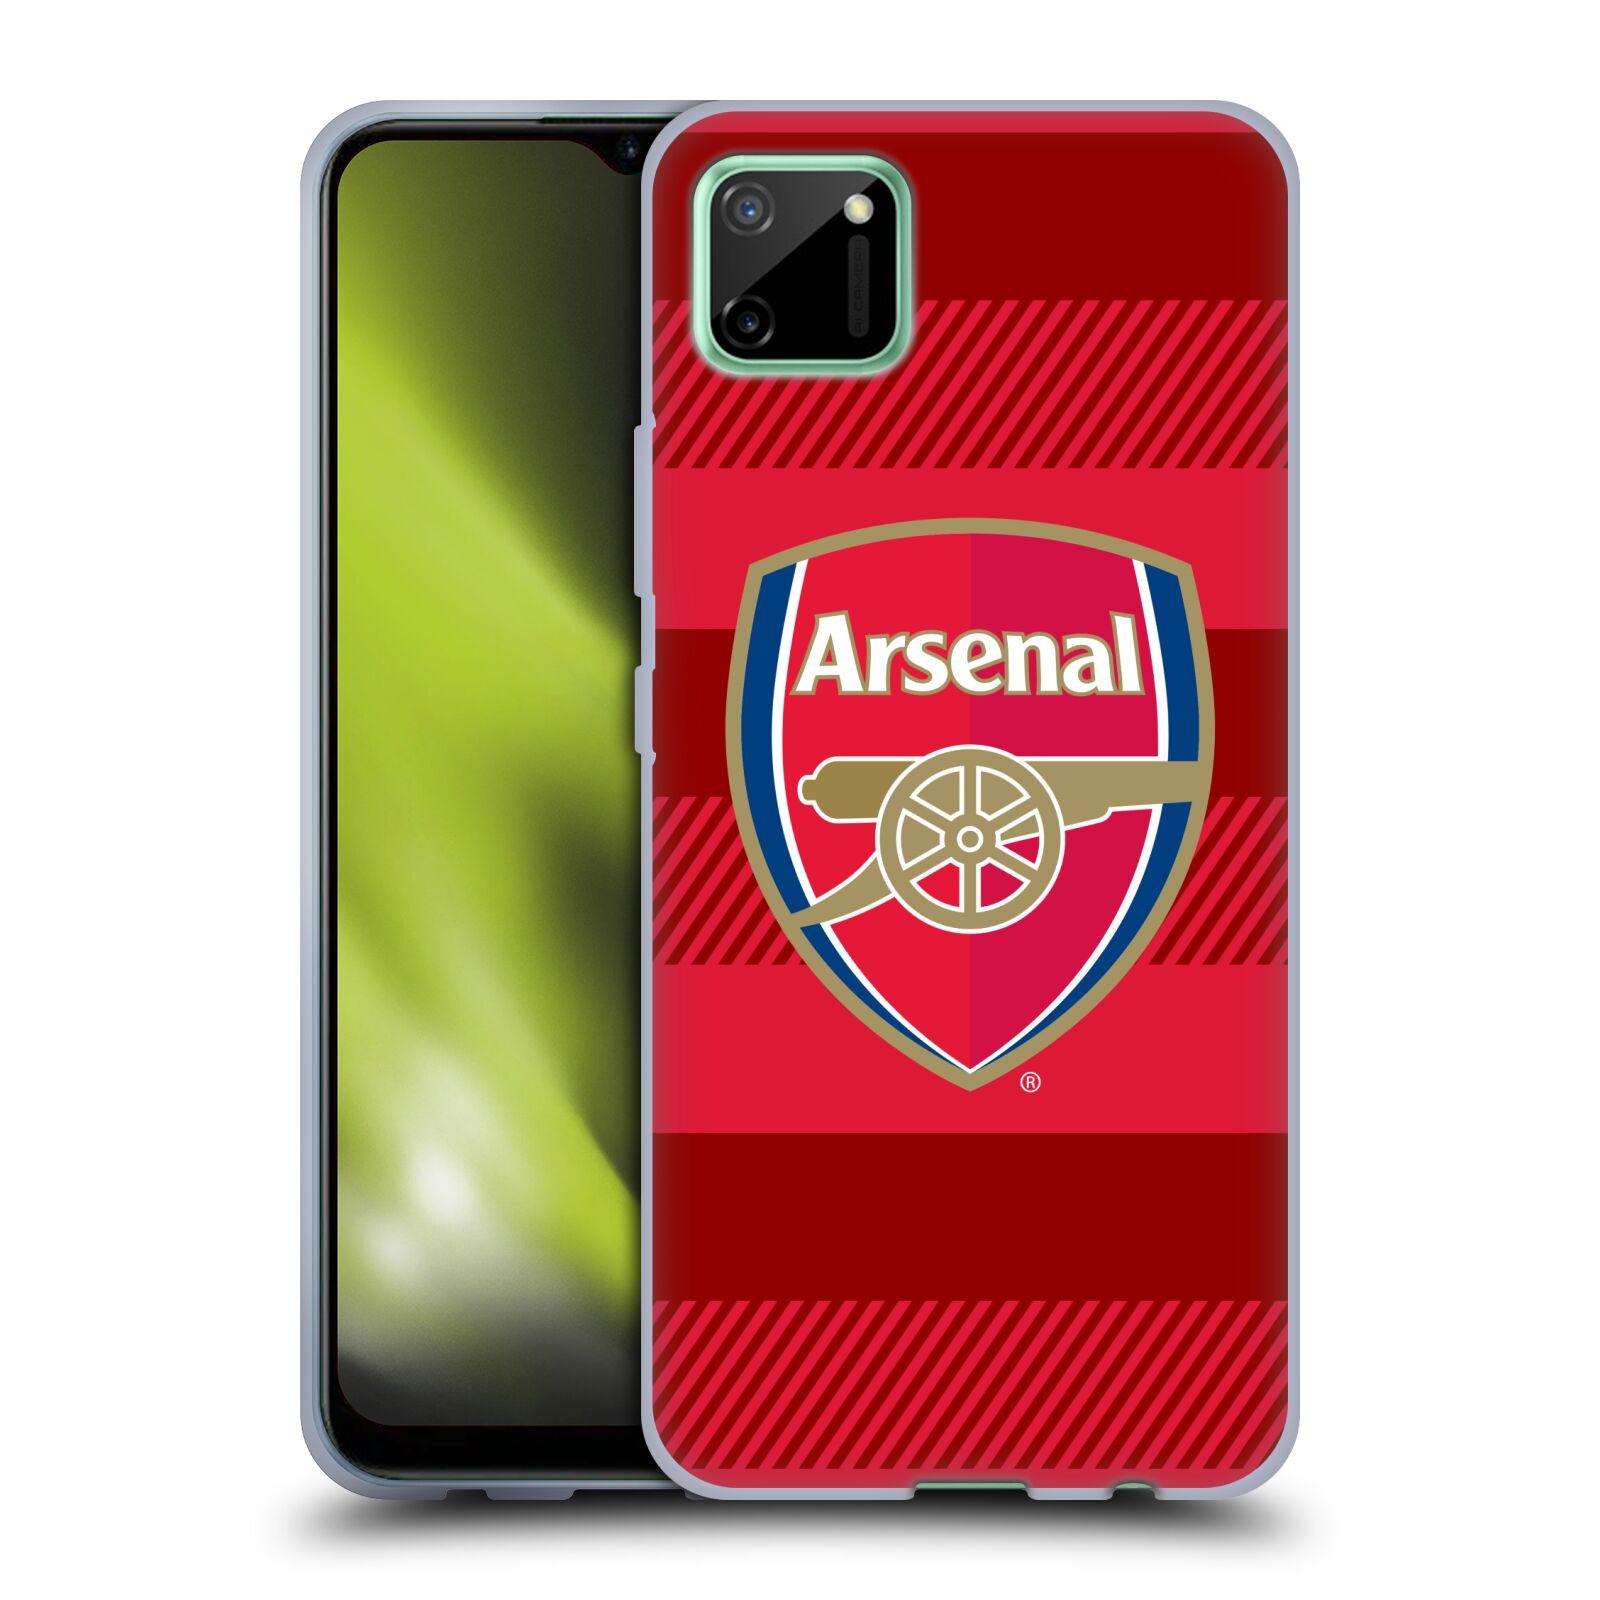 Silikonové pouzdro na mobil Realme C11 - Head Case - Arsenal FC - Logo s pruhy